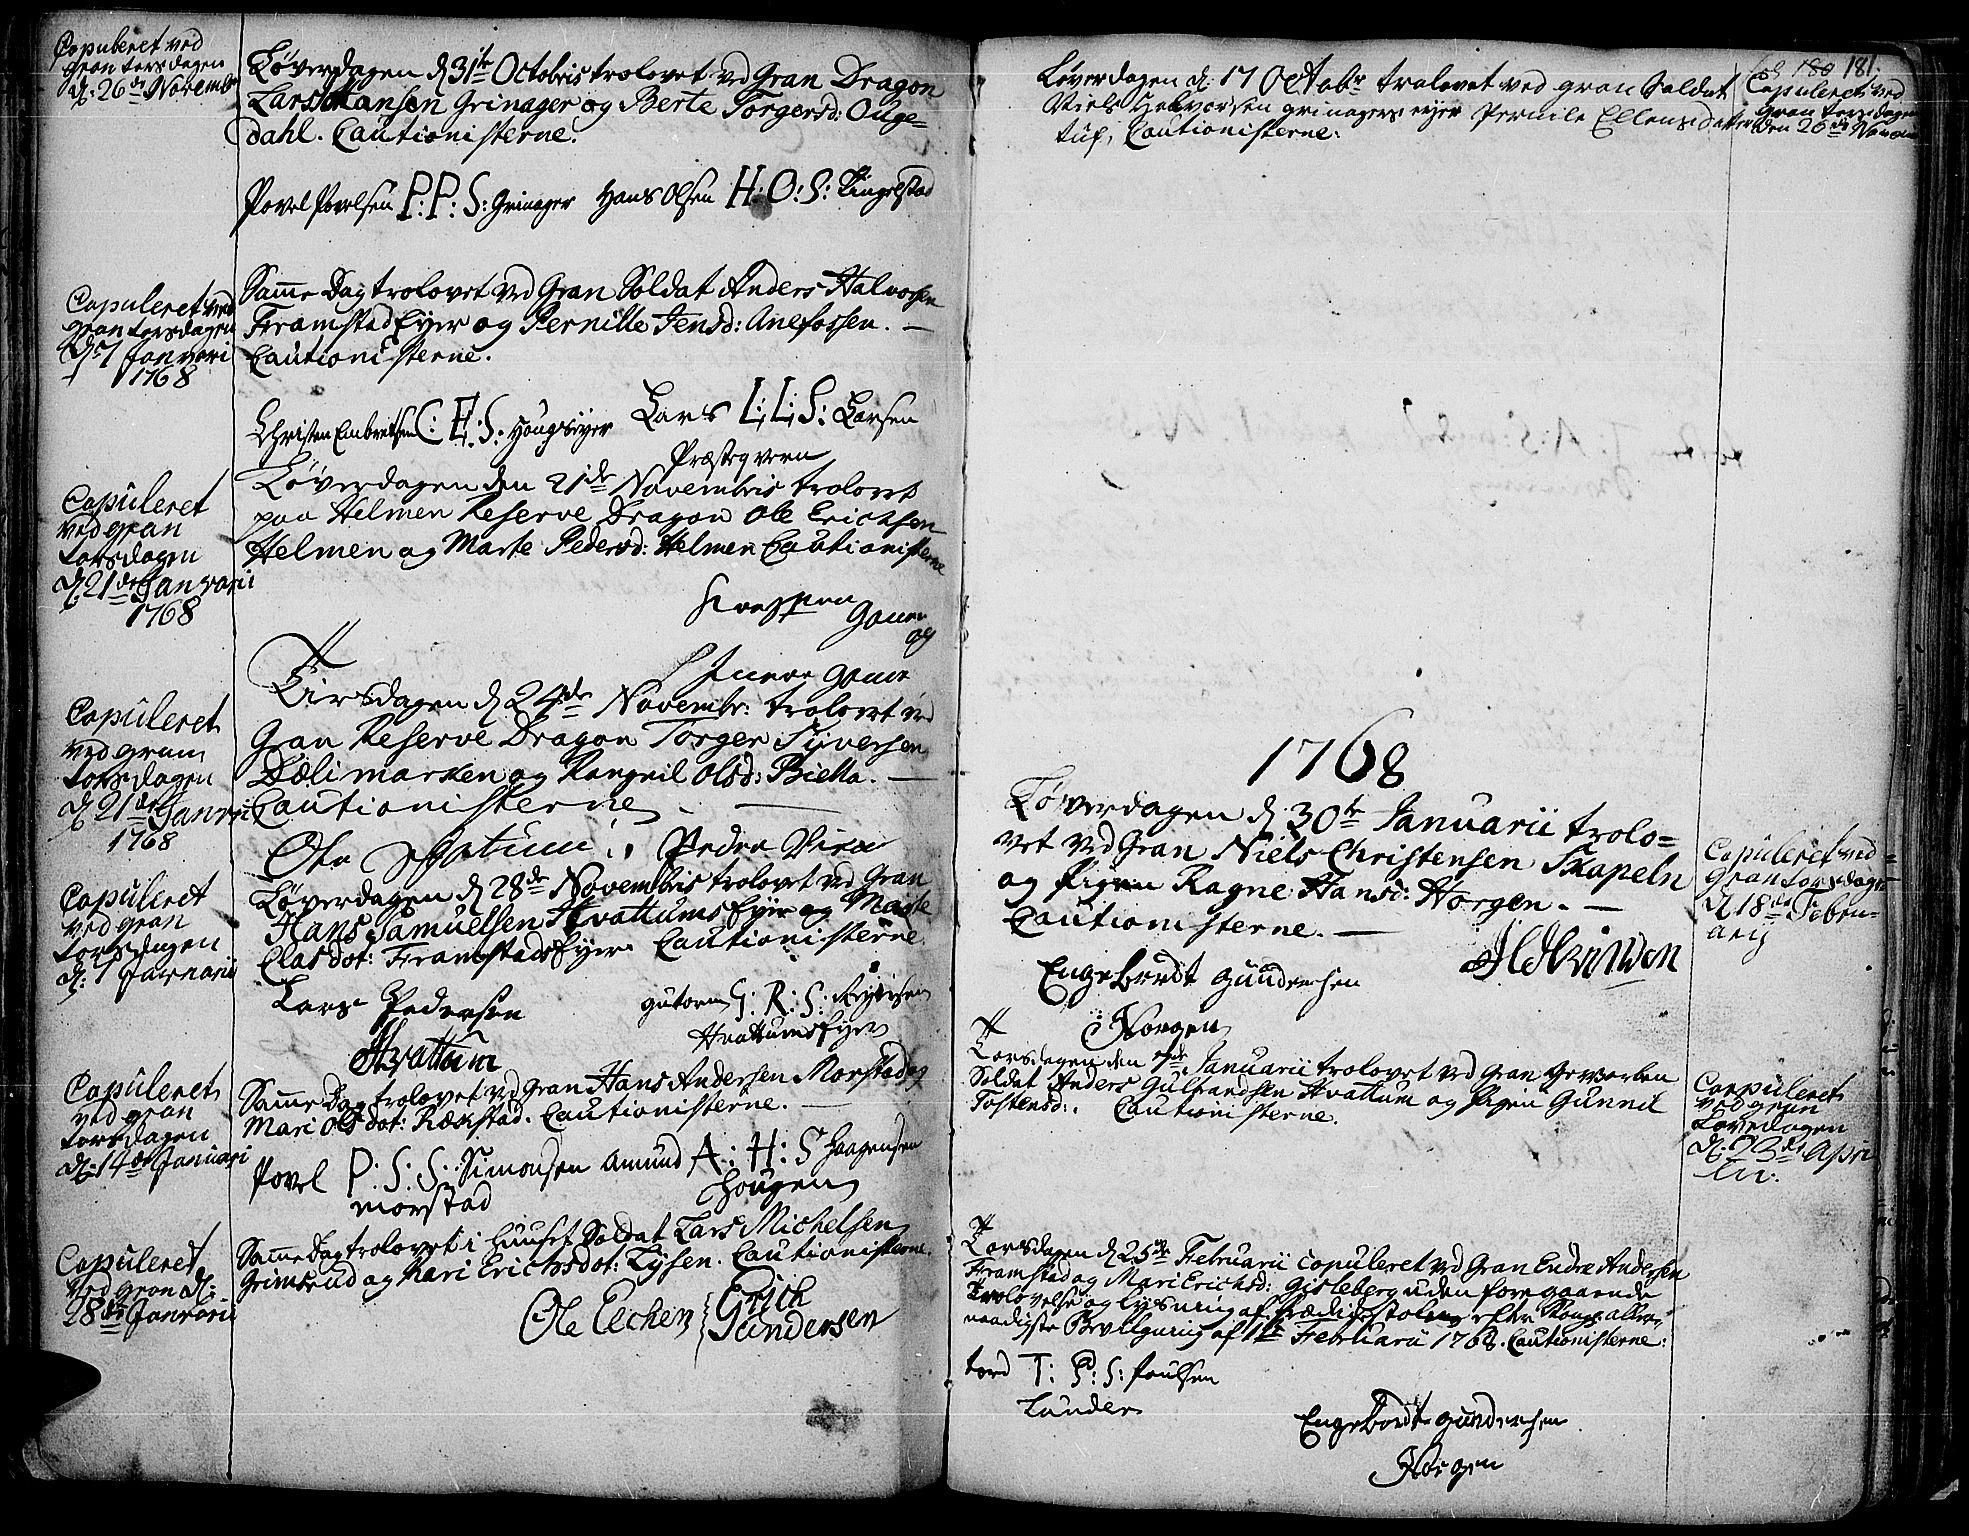 SAH, Gran prestekontor, Ministerialbok nr. 4, 1759-1775, s. 181